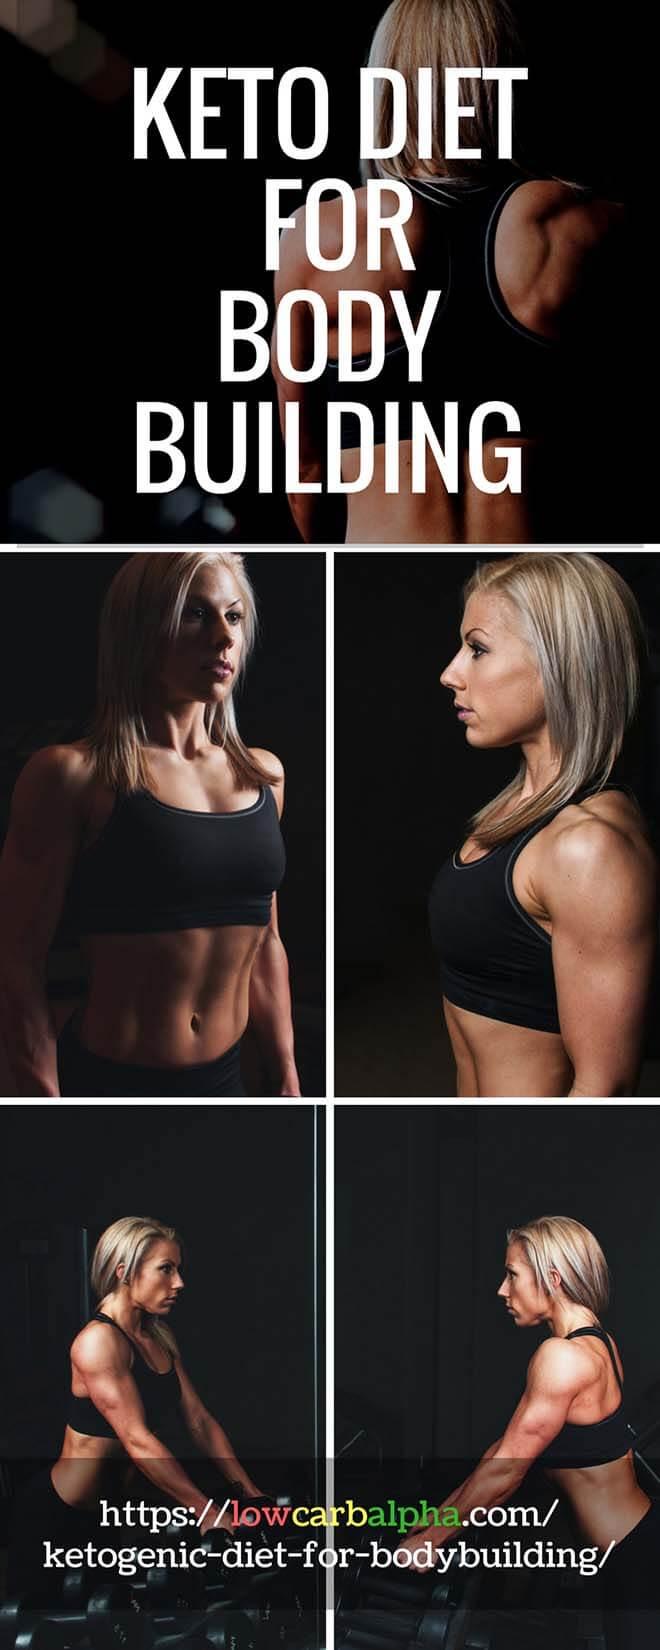 Keto Diet for Bodybuilding #lowcarb #keto #LCHF #lowcarbalpha